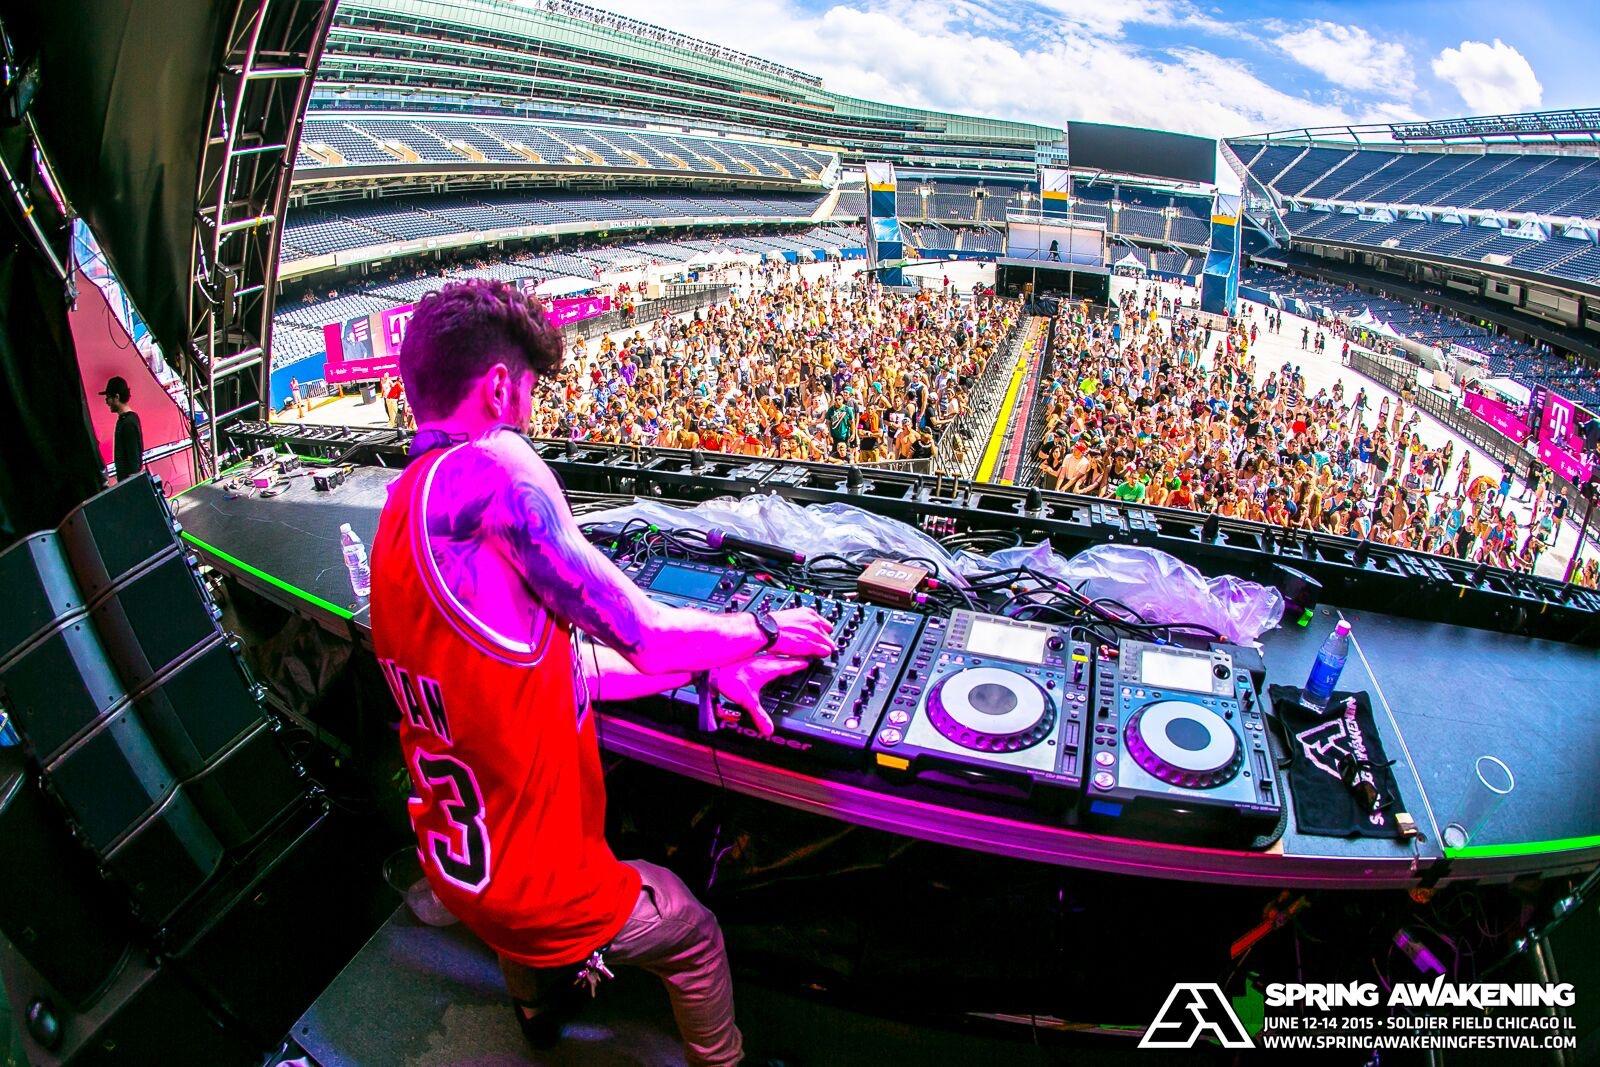 DJ GoodSex playing tracks